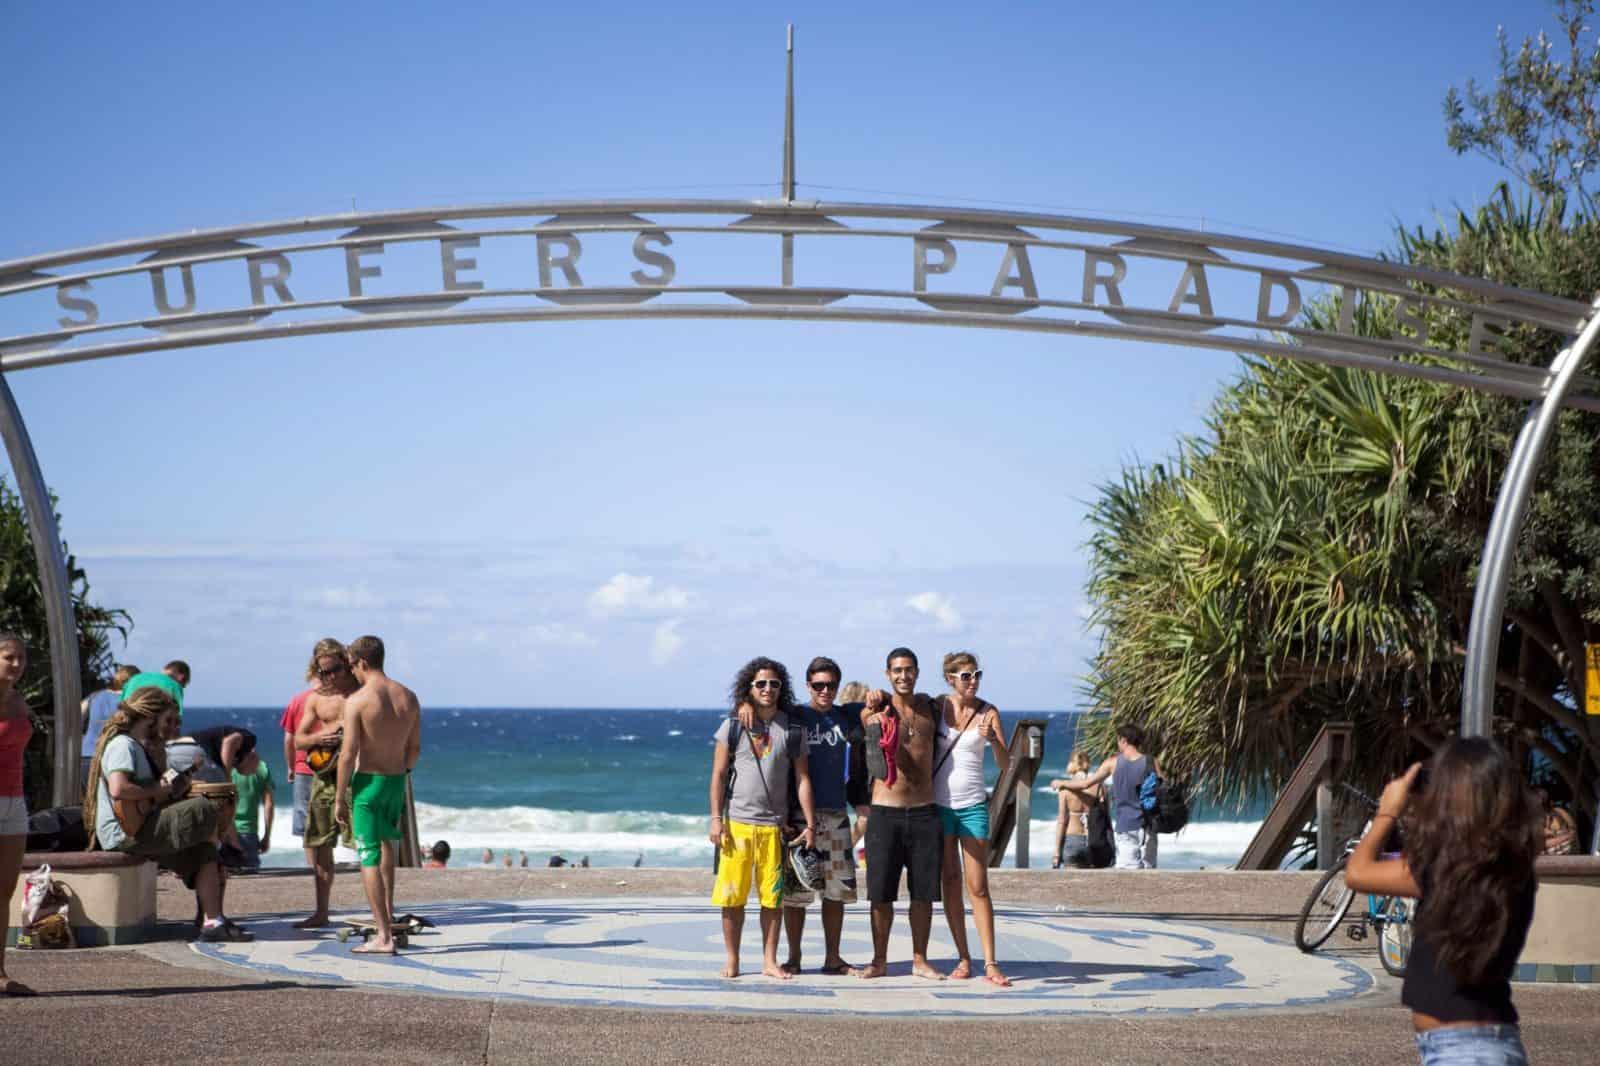 from Jeremy australia gay paradise surfers